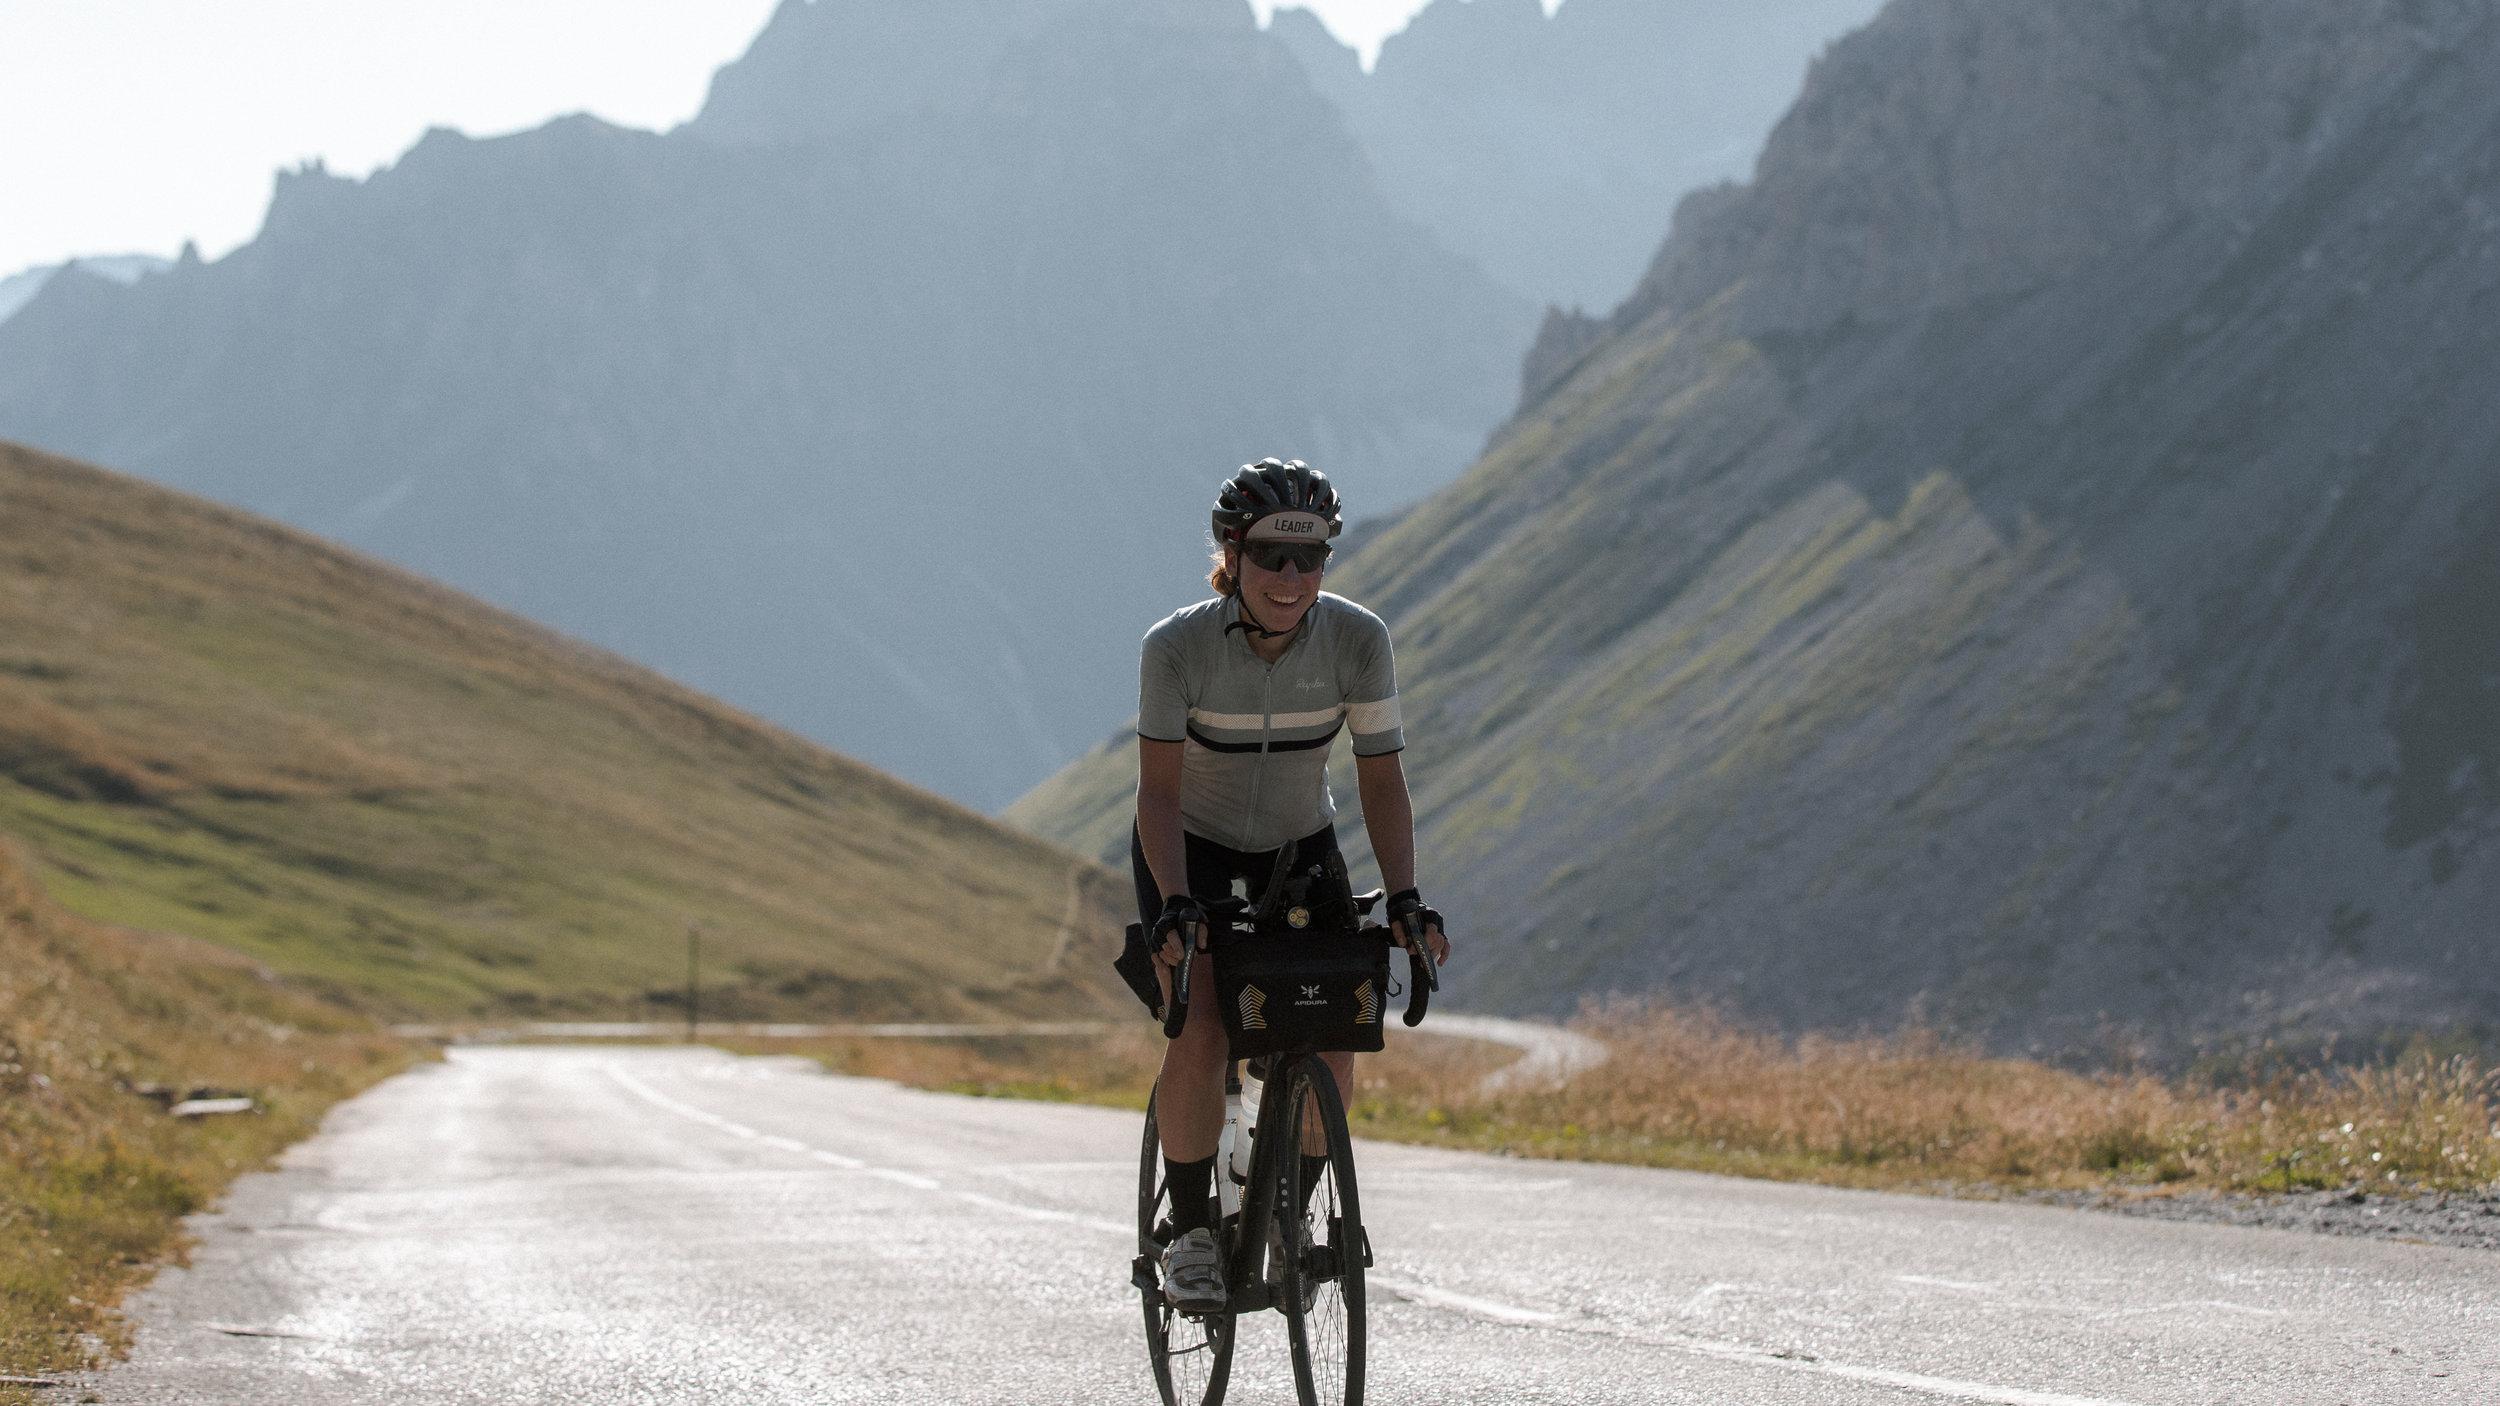 Fiona_Kolbinger_French_Alps_Angus_Sung_Photo.jpg